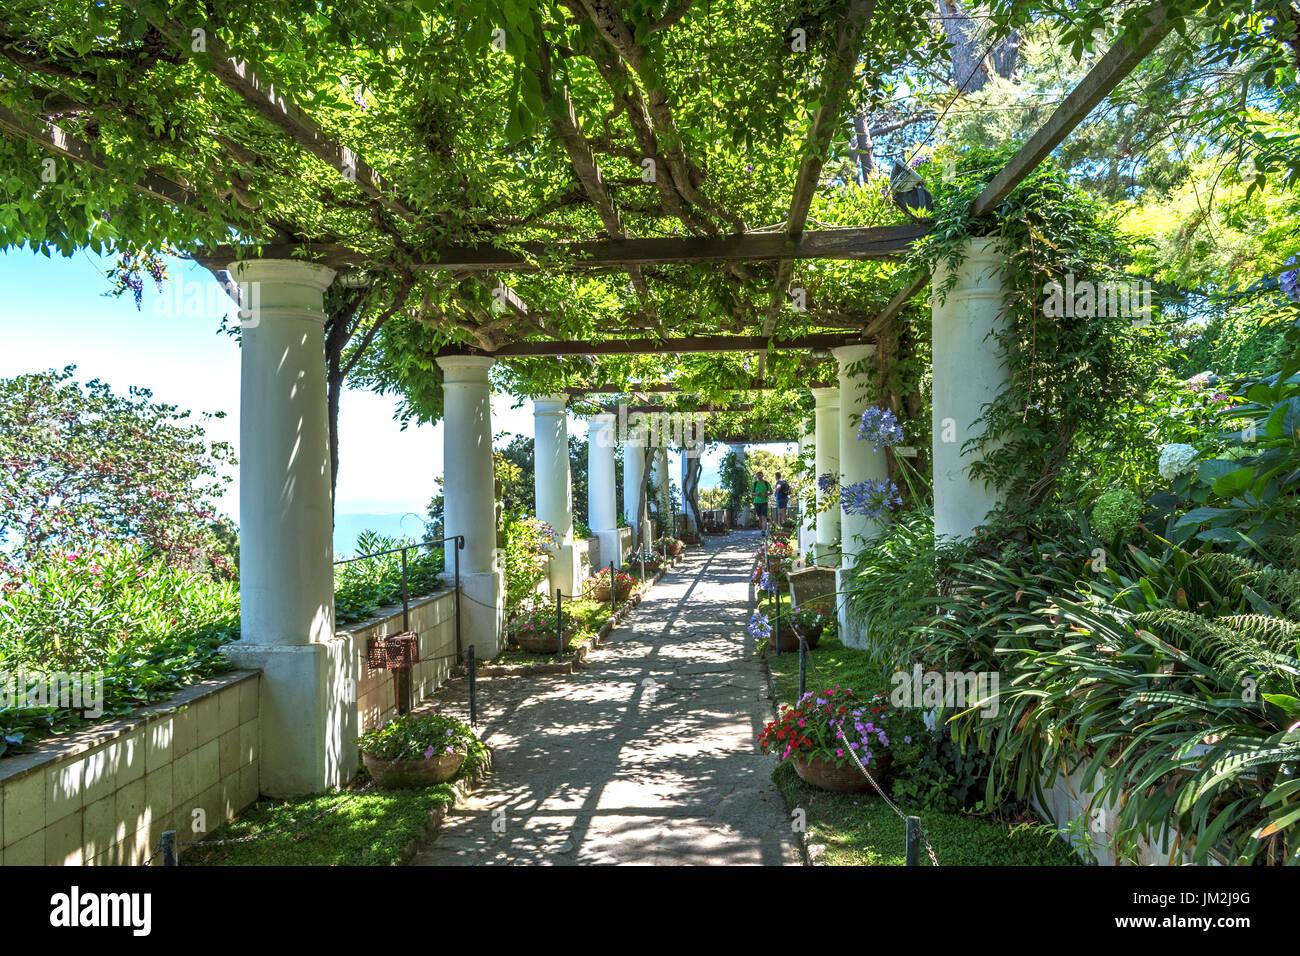 The Gardens Of Villa San Michele In Anacapri On The Island